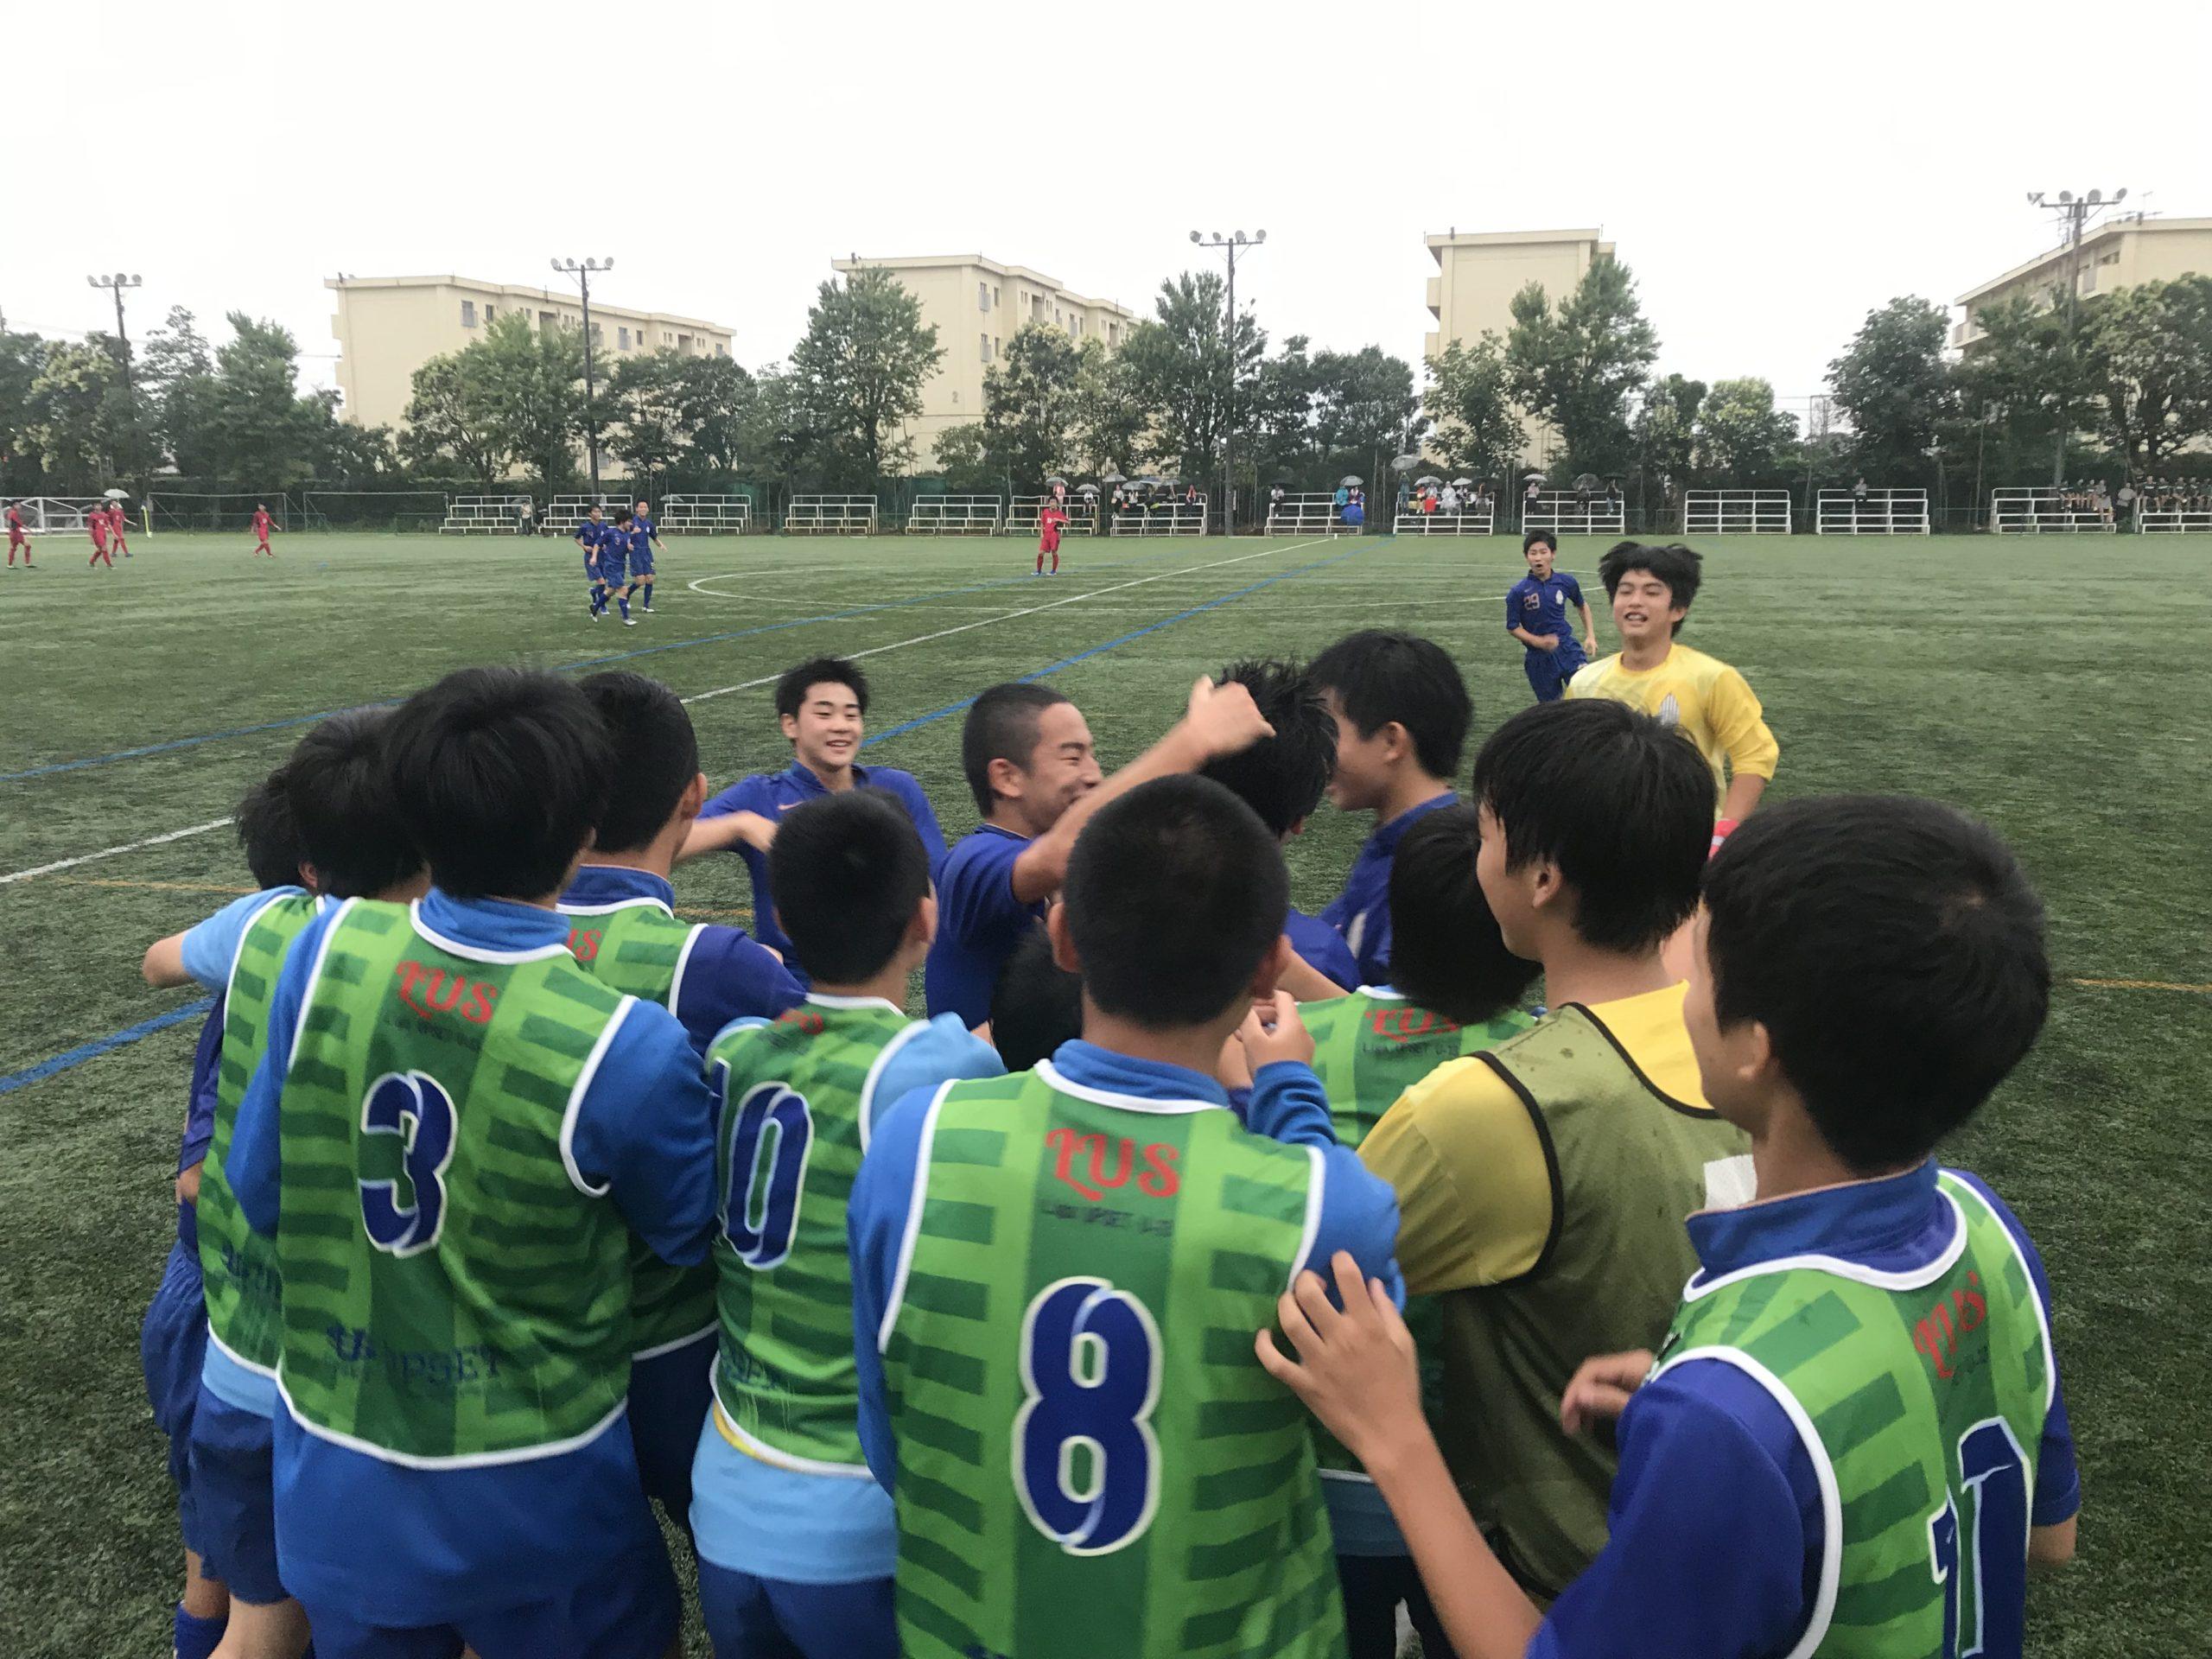 【U15】高円宮杯 U-15サッカー千葉県1部リーグ 第13節